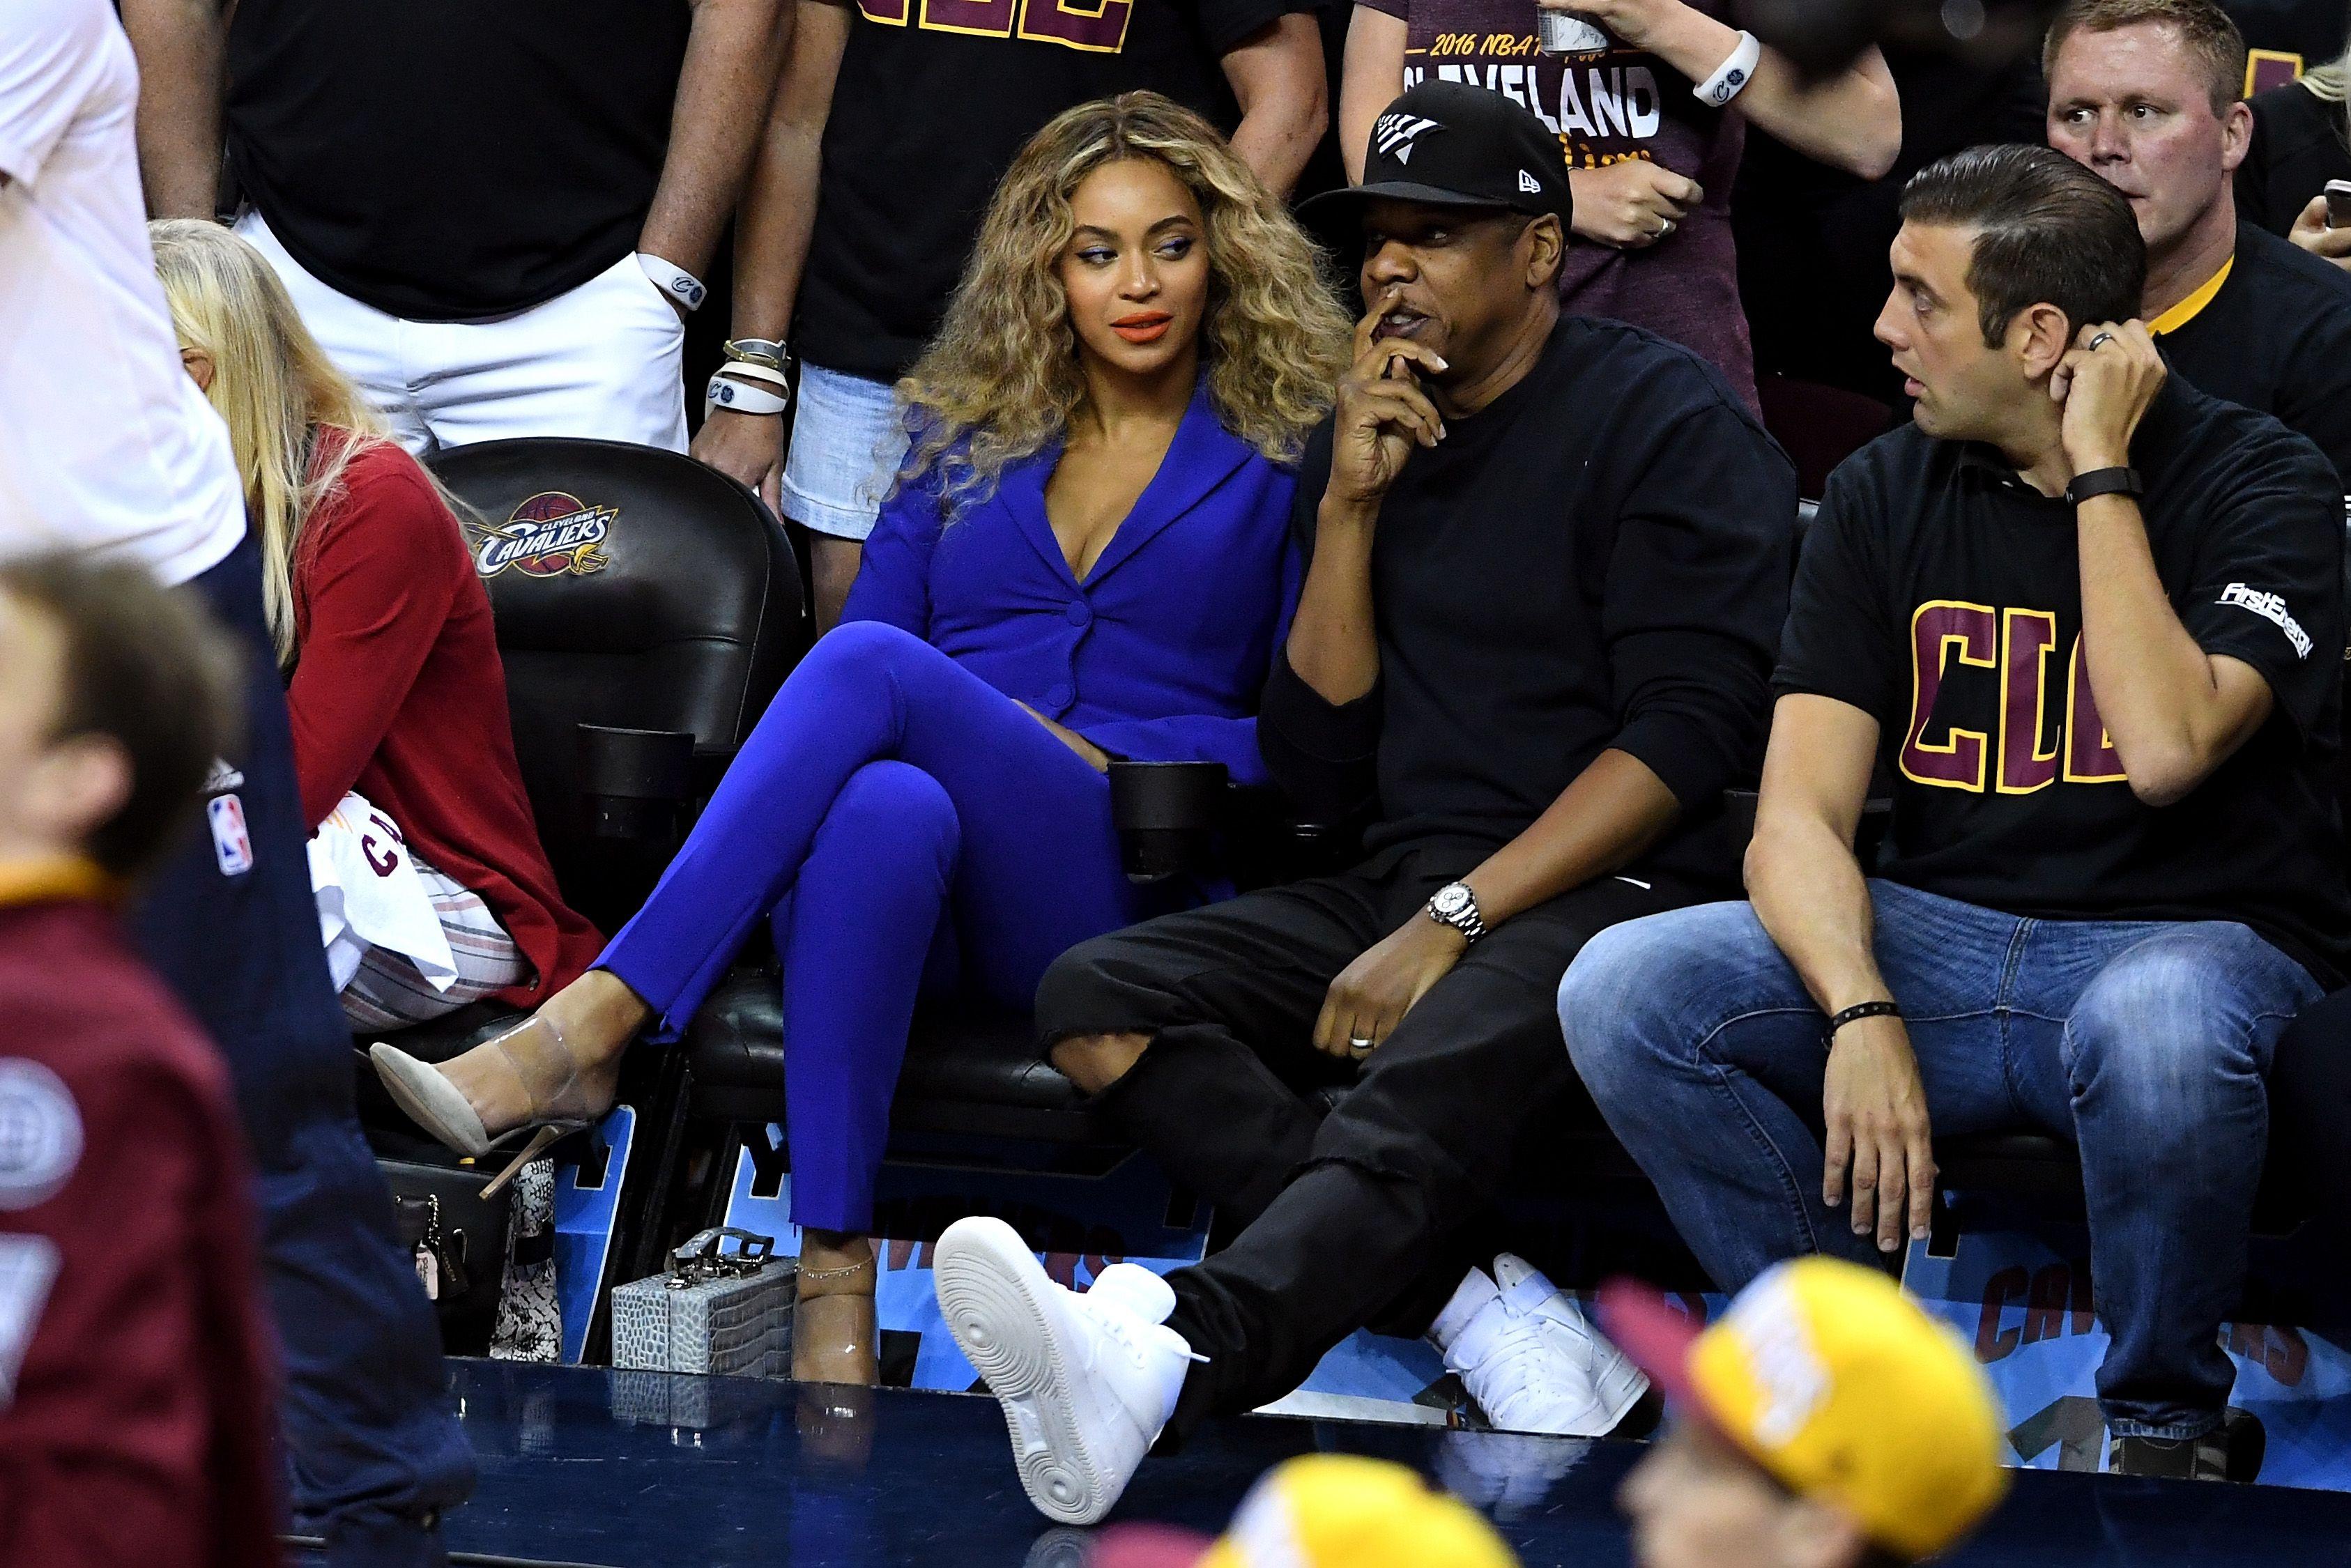 3af47ea11c28cc The Real Story Behind Beyoncé s Courtside Side-Eye - Beyoncé NBA Finals Side-Eye  Photo